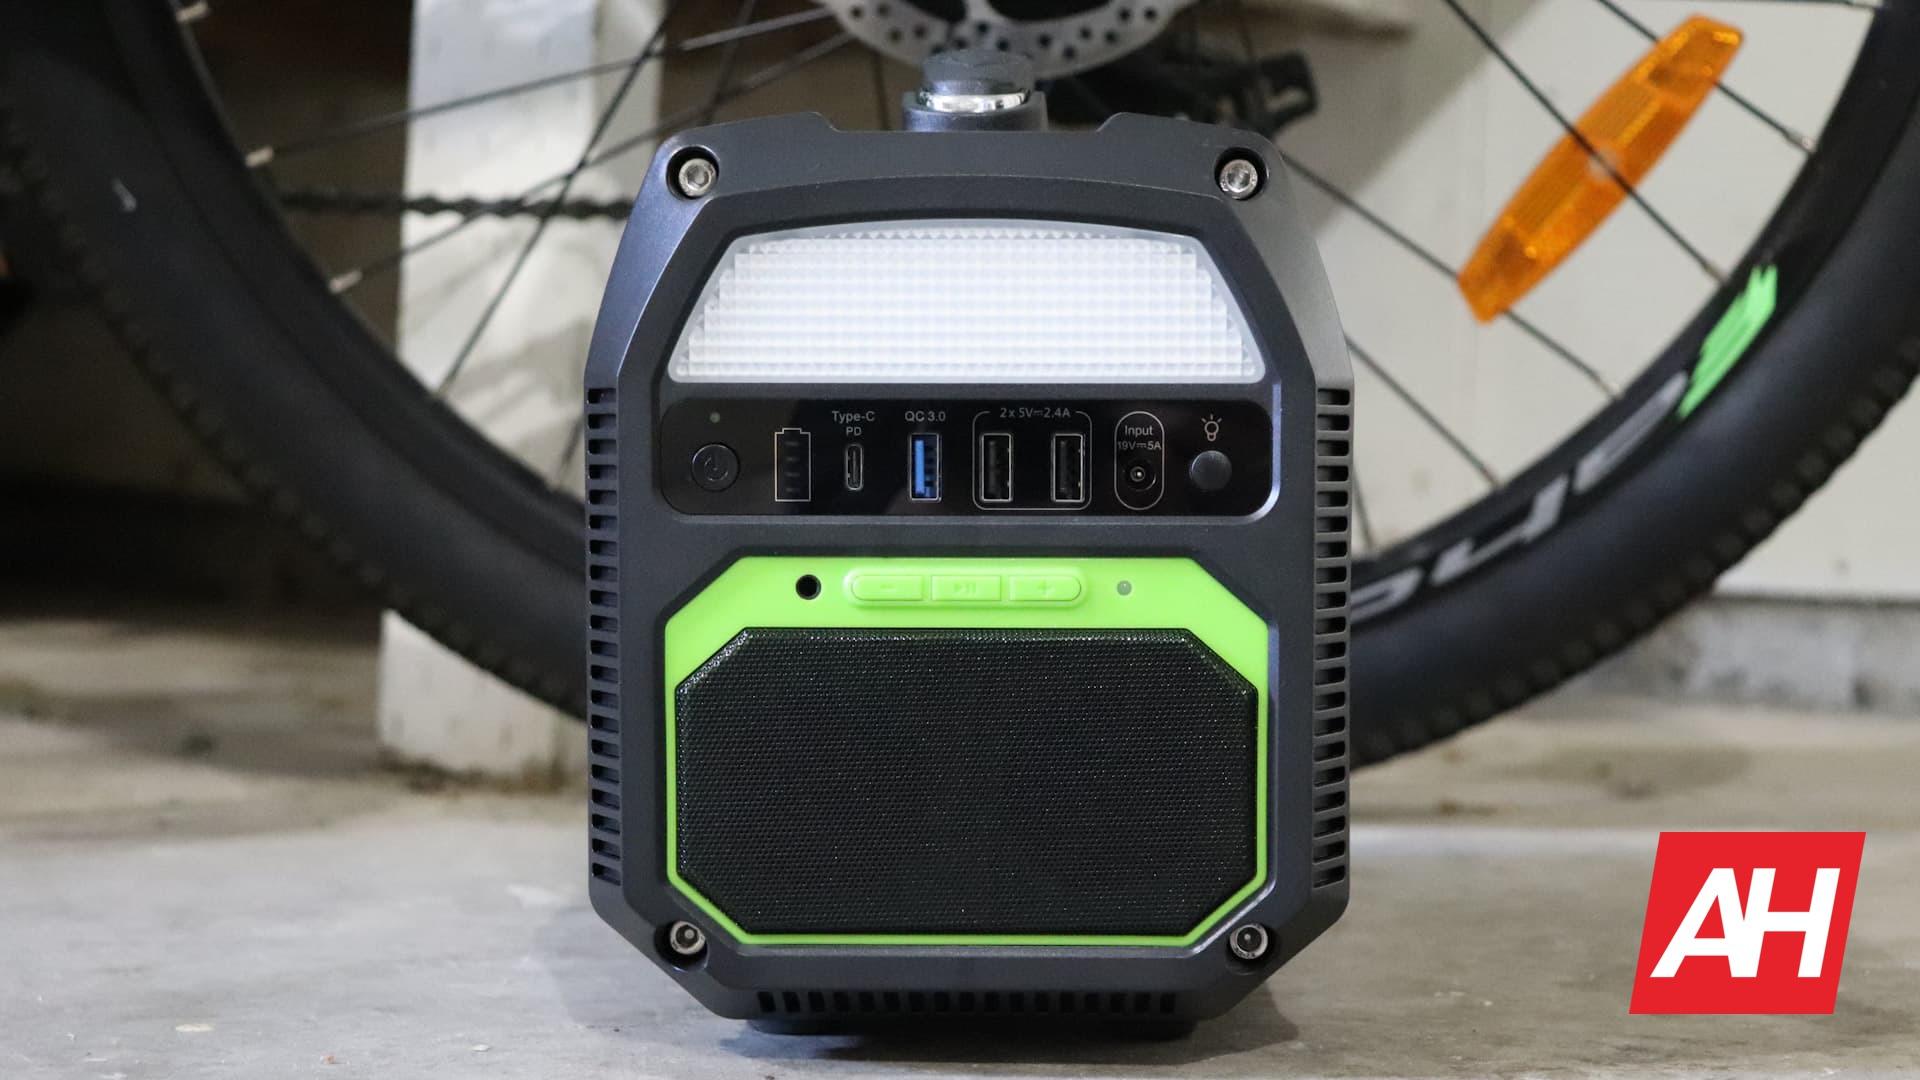 01 0 iForway PS500N Portable Powerstation hardware DG AH 2020